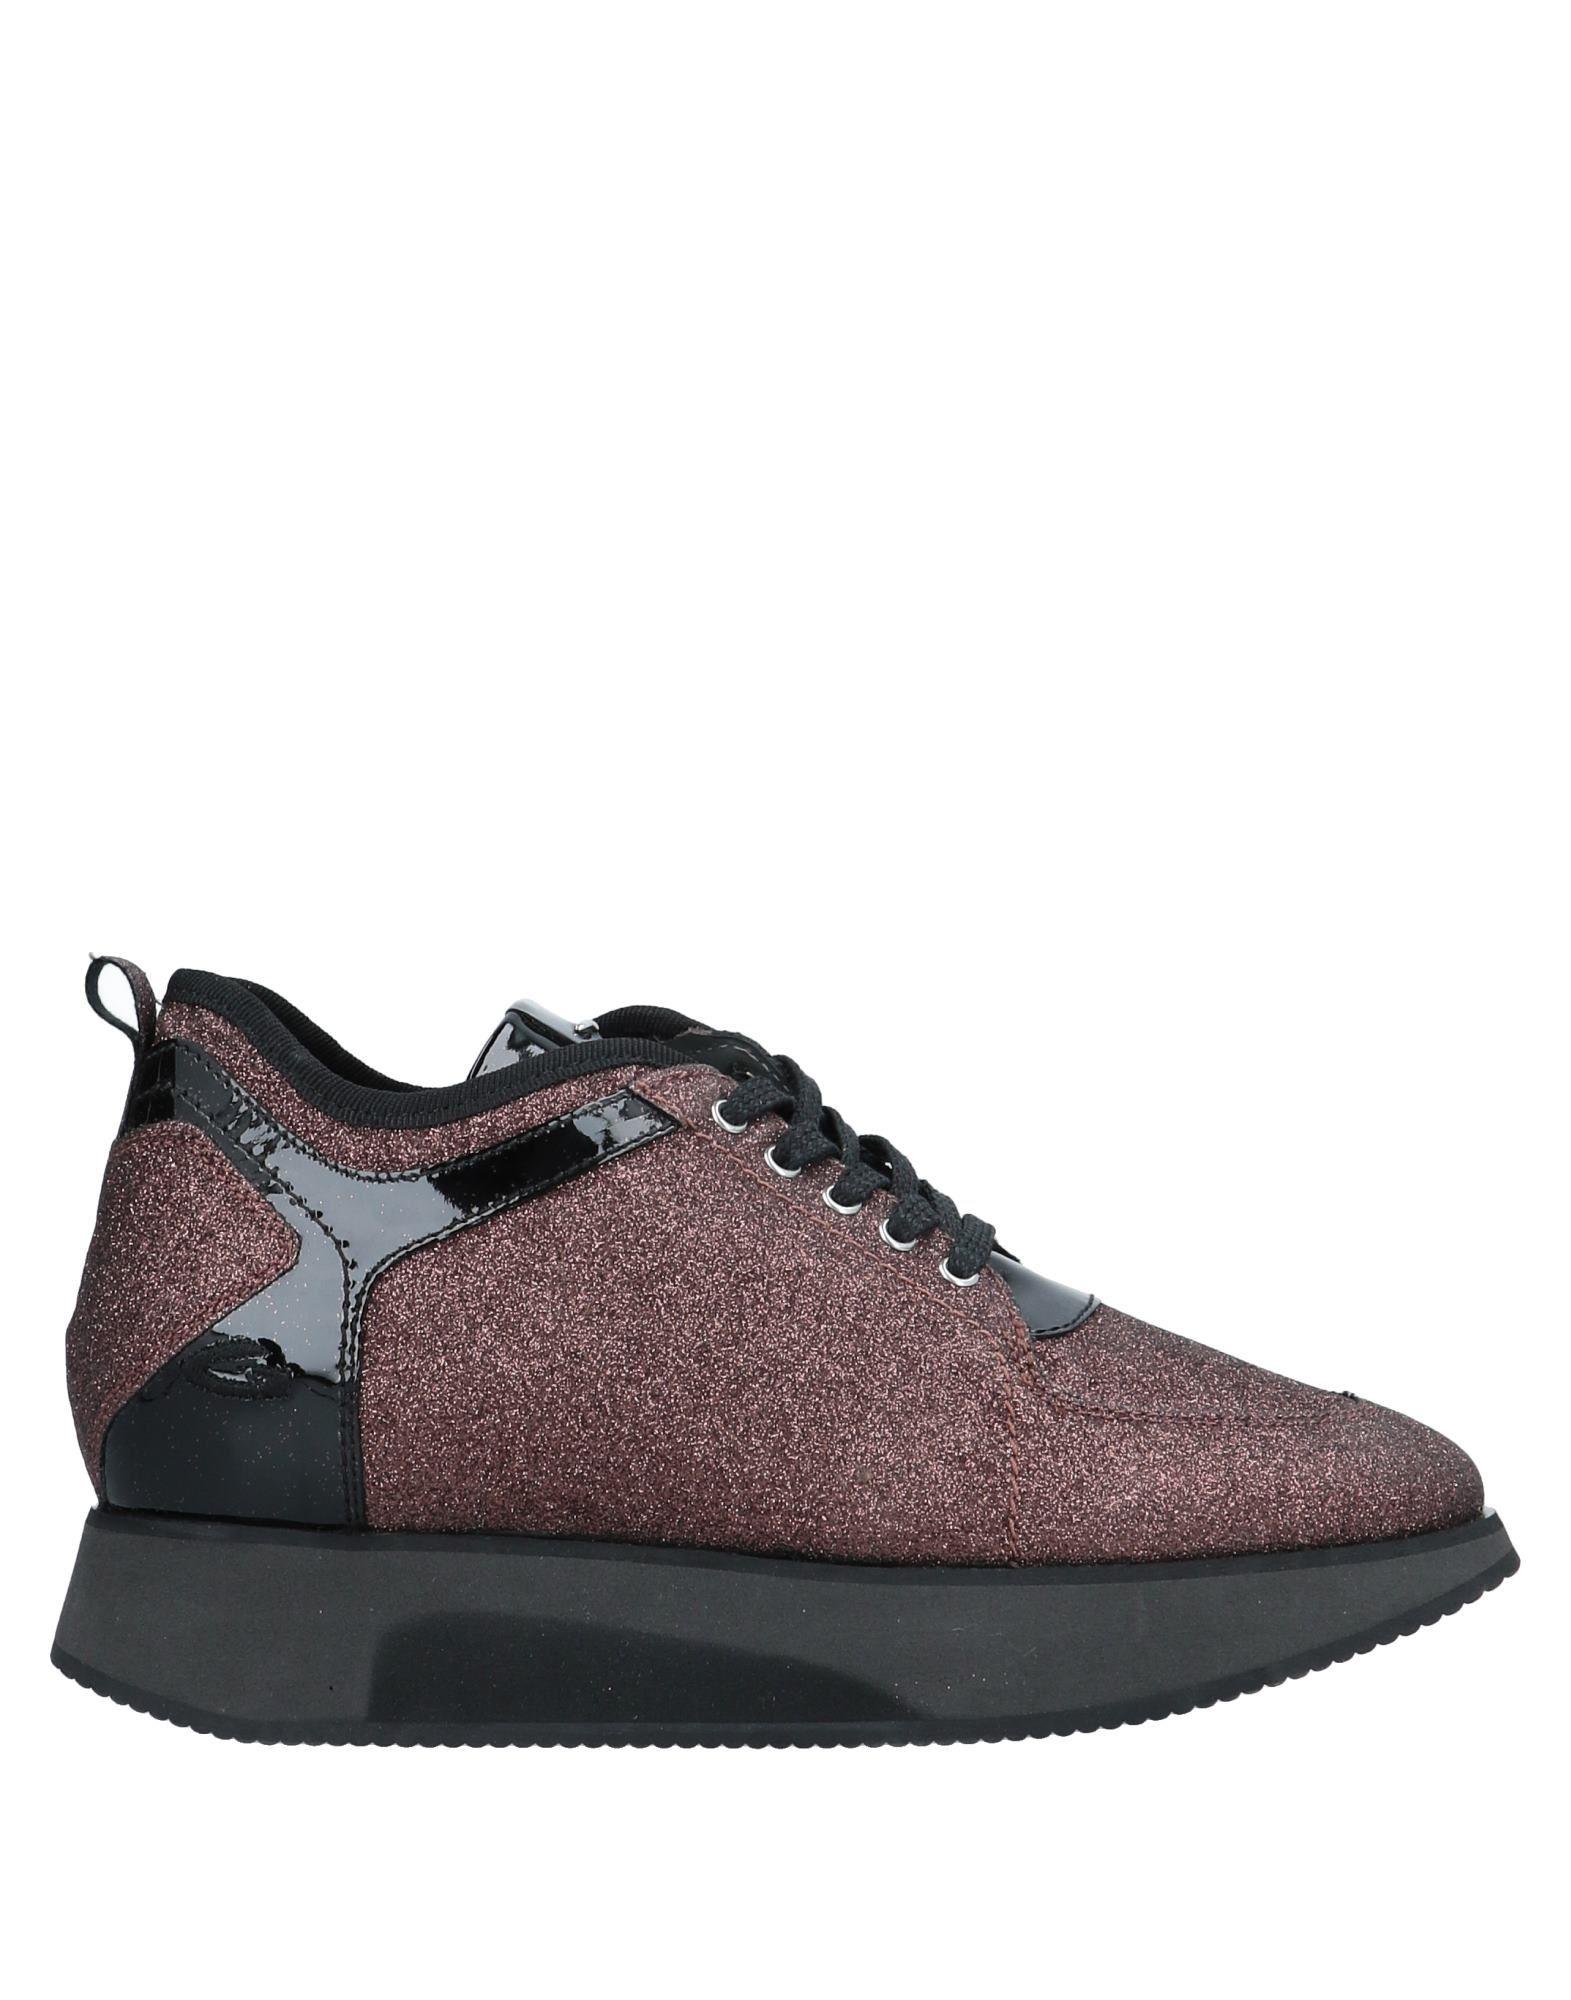 Alberto Guardiani Sneakers - Women on Alberto Guardiani Sneakers online on Women  Australia - 11567954DB 3dfb76